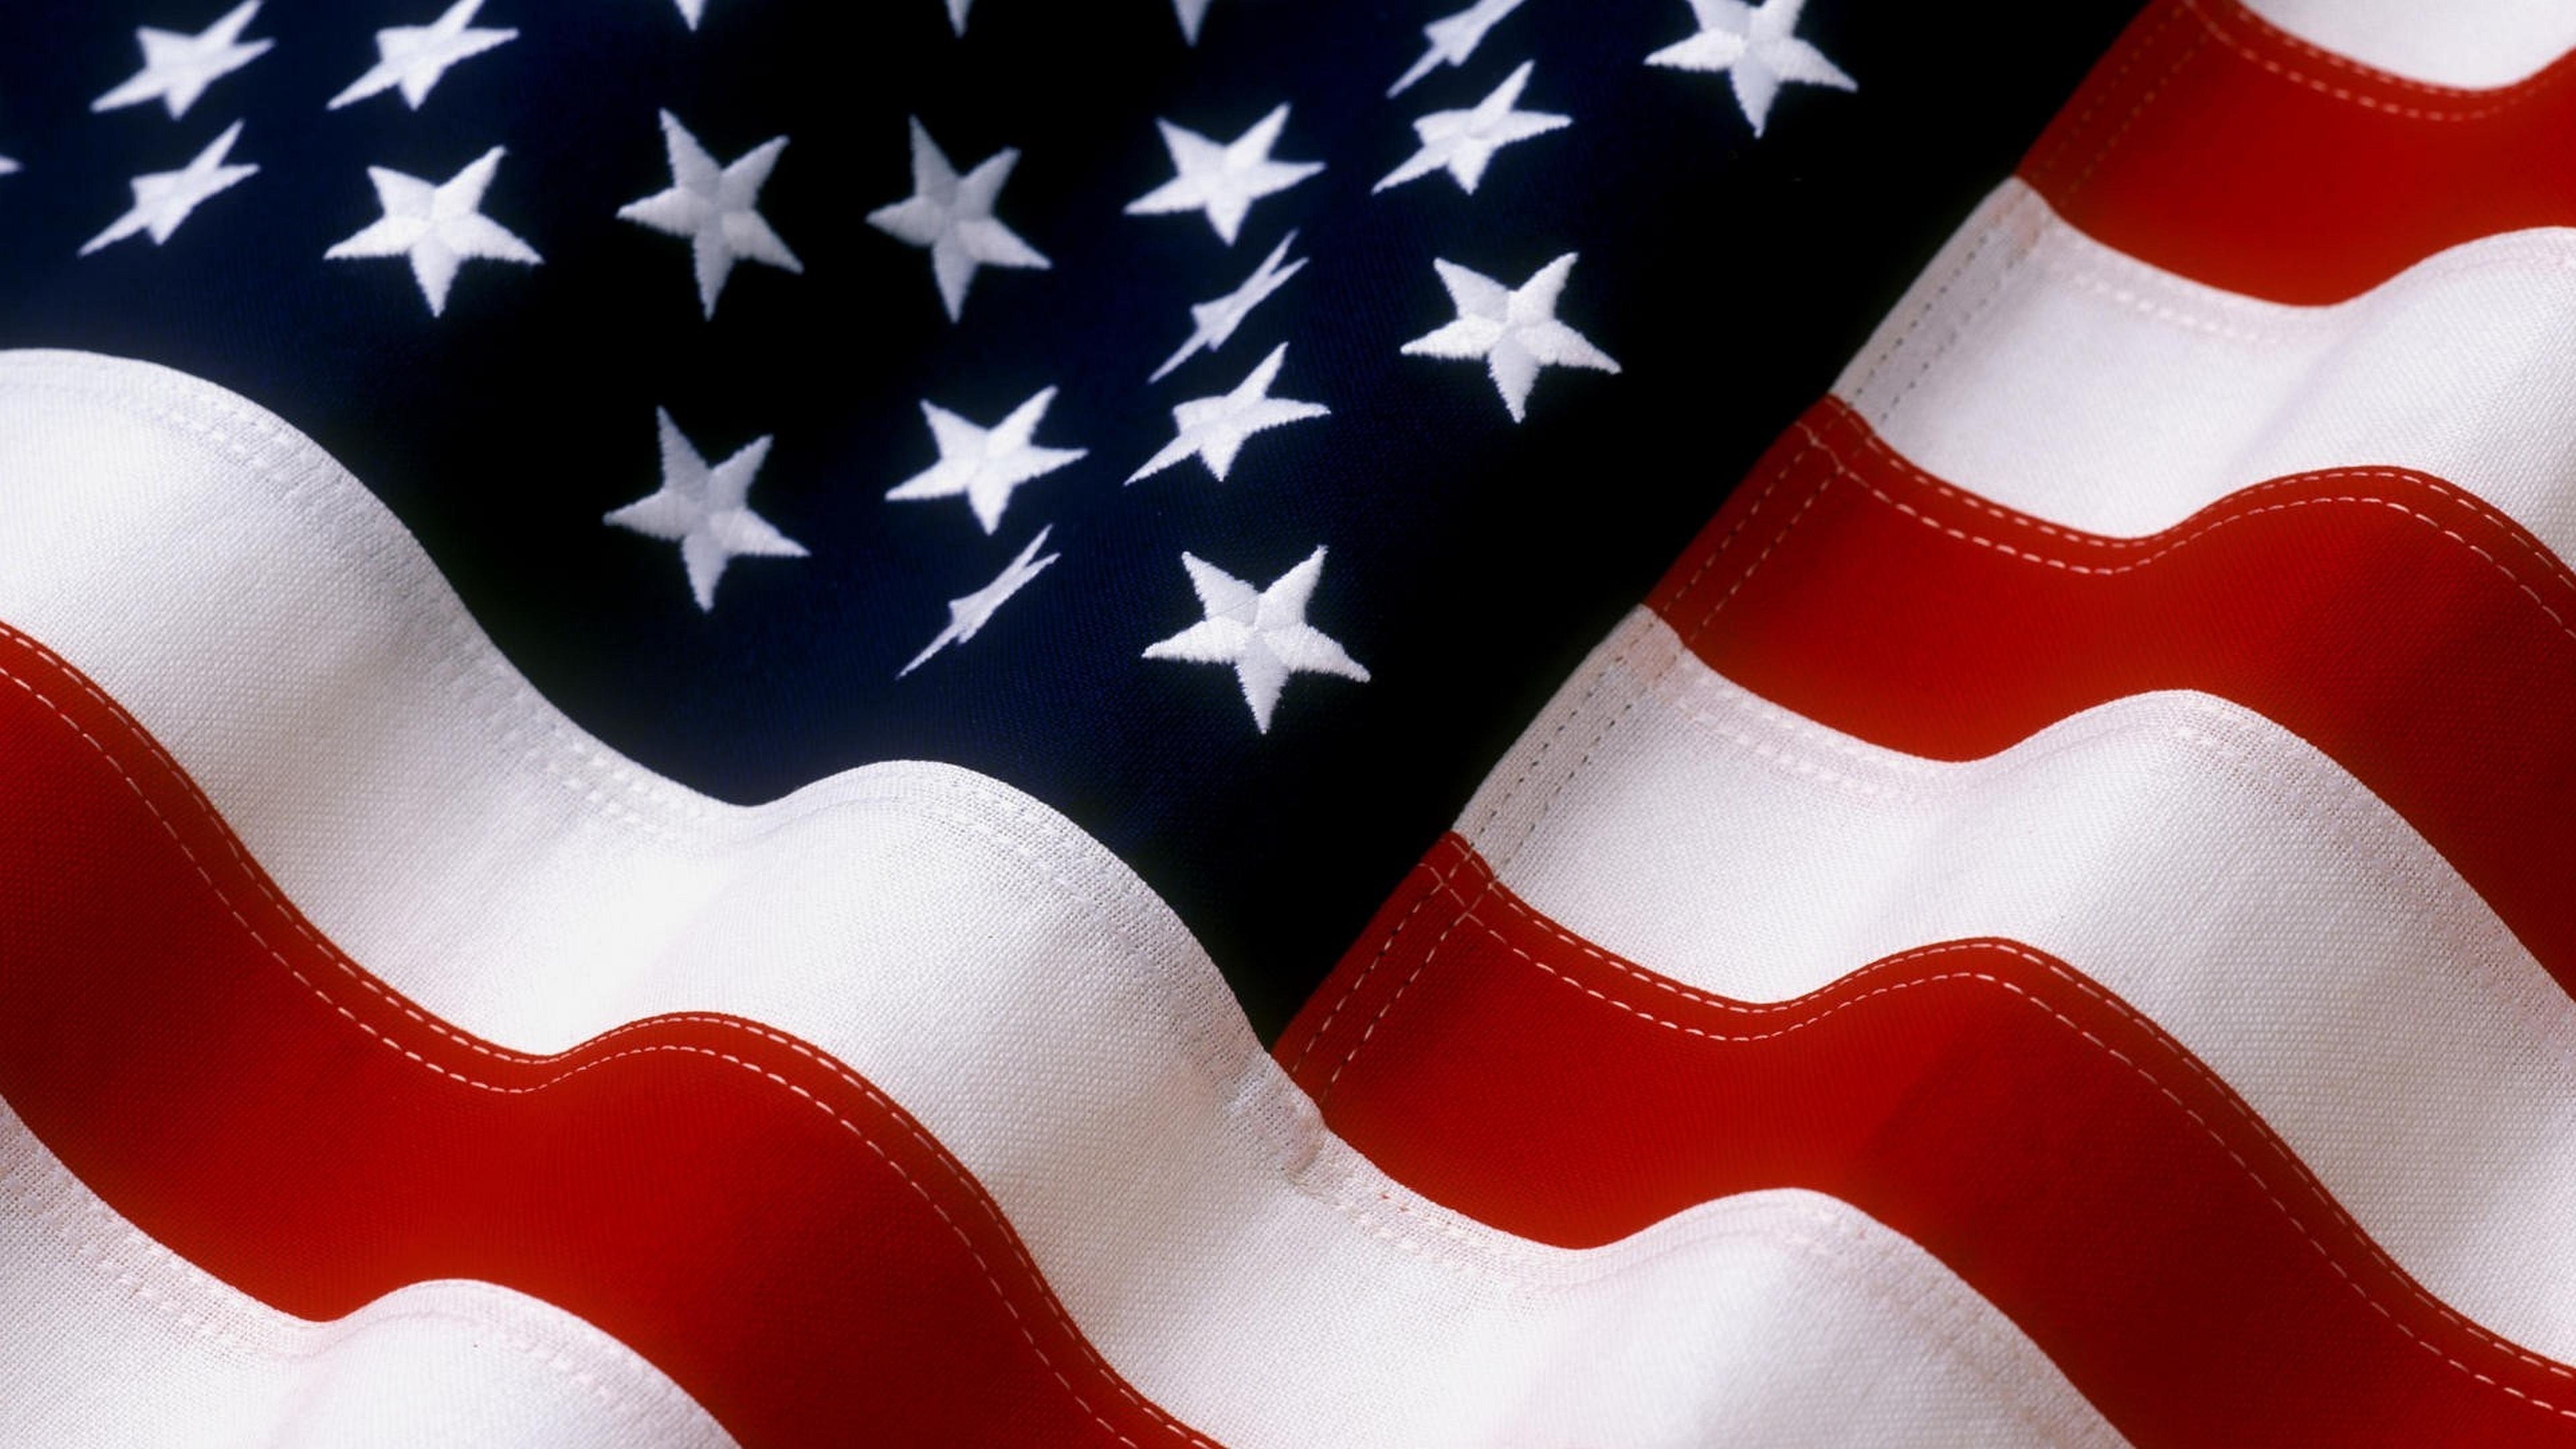 flag | free download hd desktop wallpaper backgrounds images - page 2